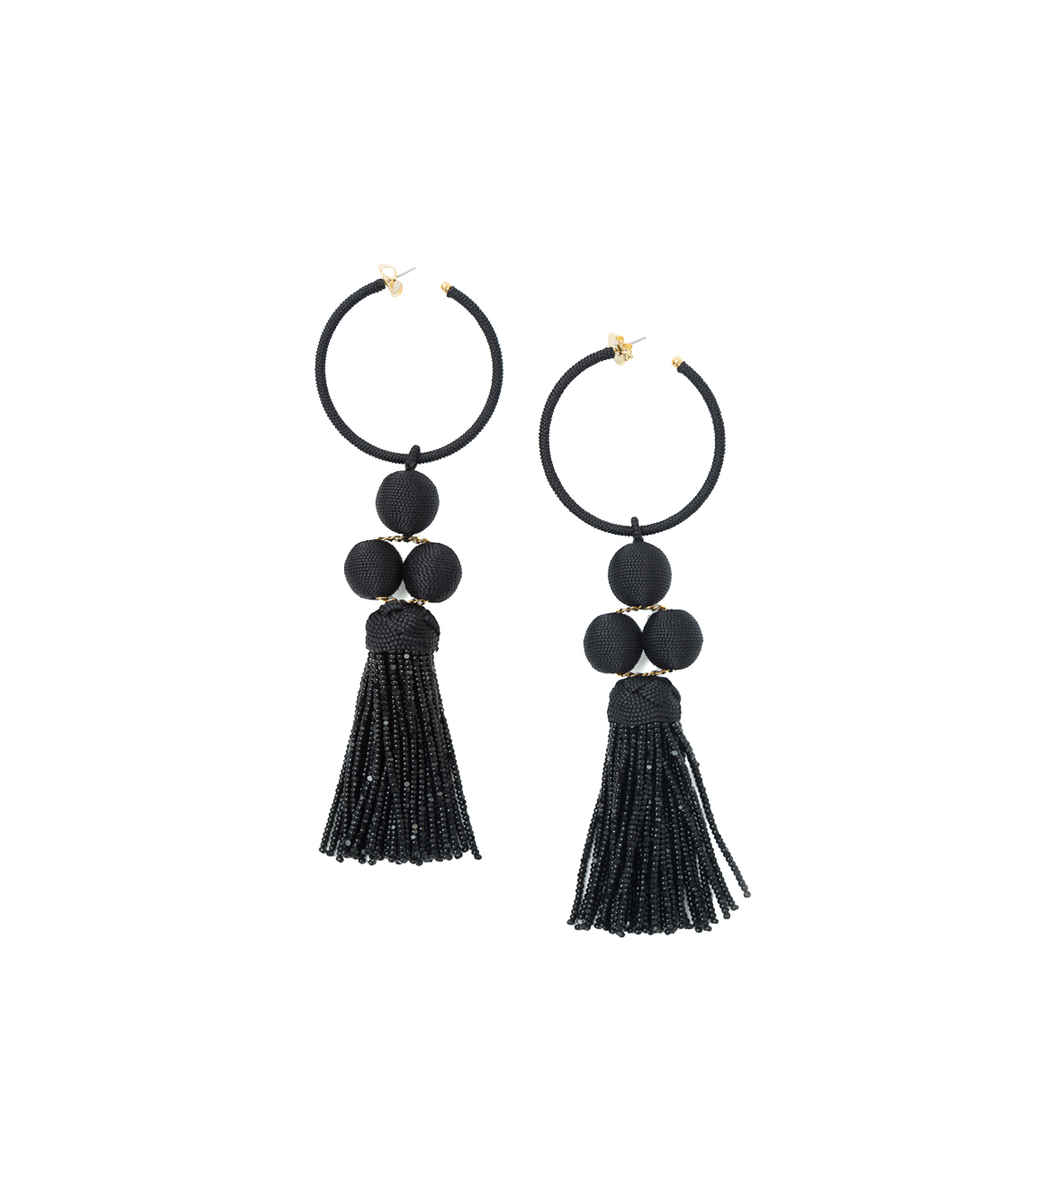 Rebecca De Ravenel Black Cha Cha Tassel Earring